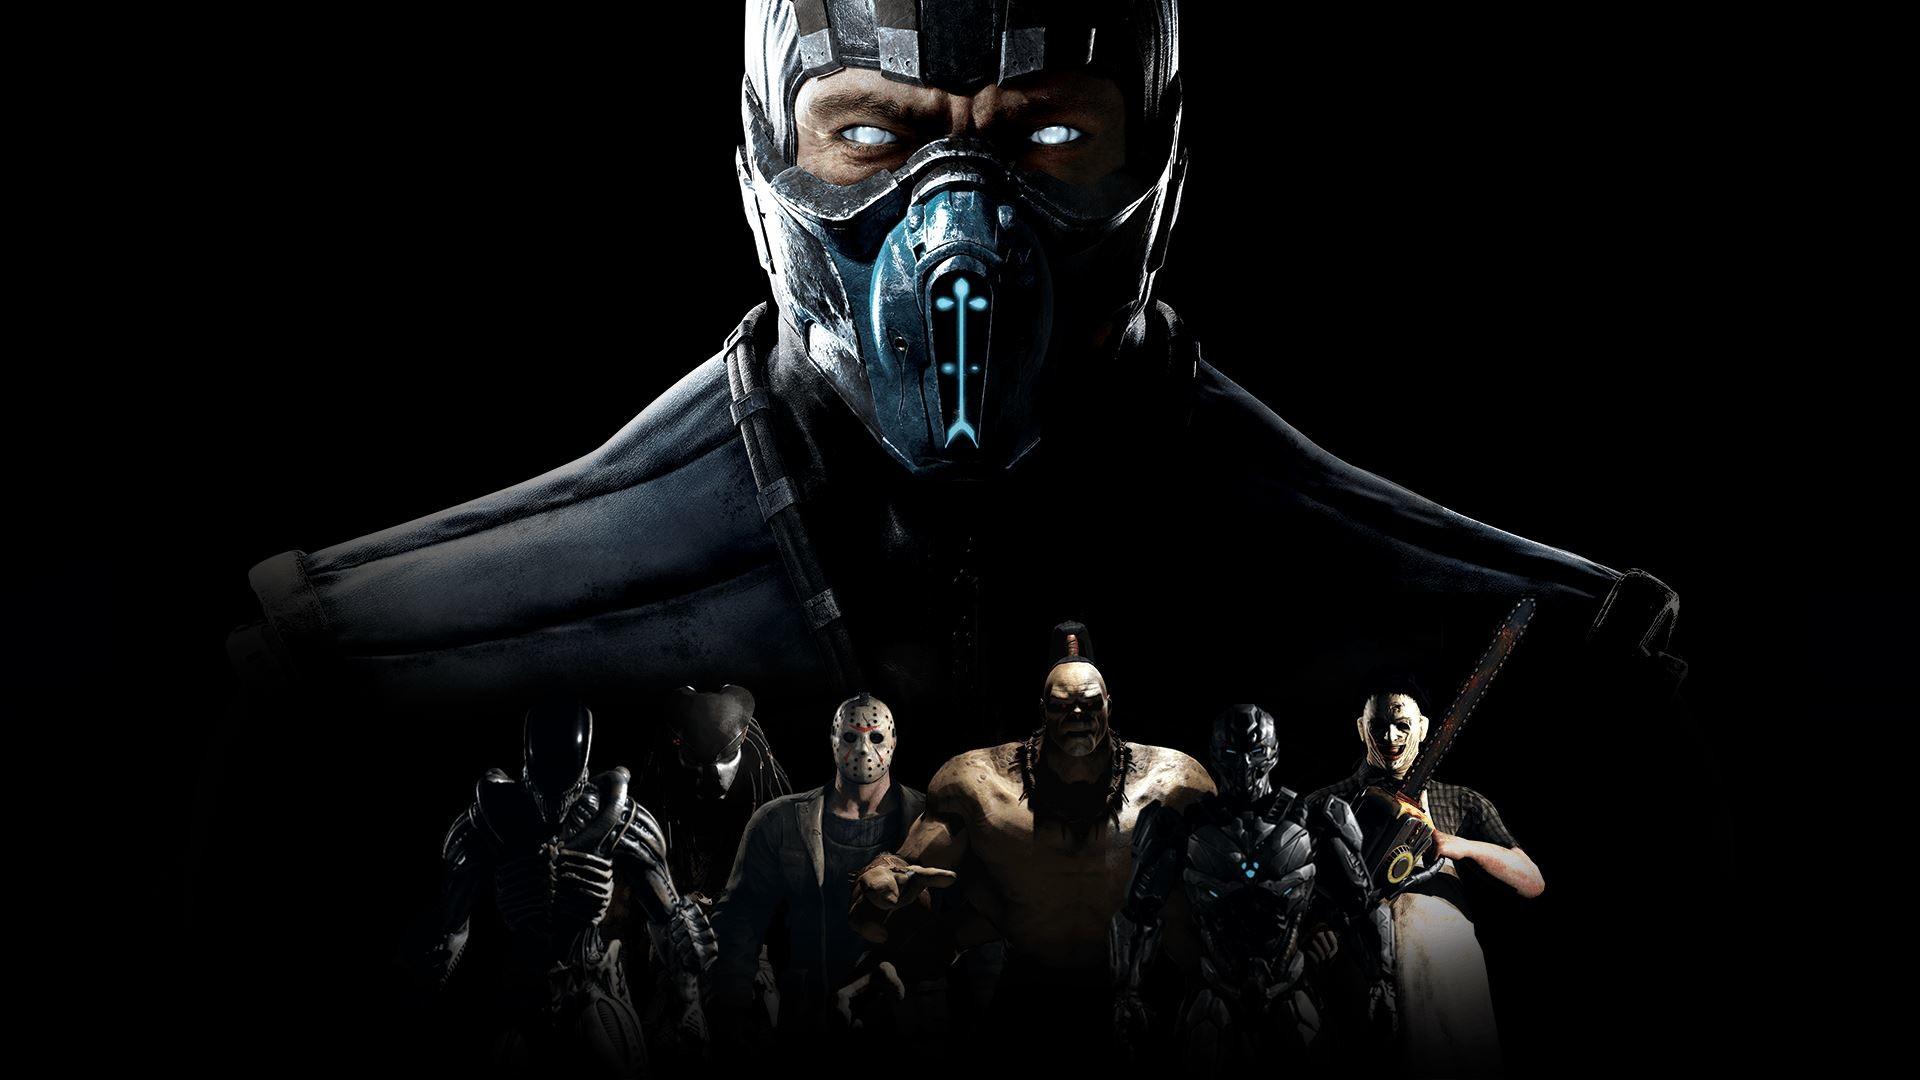 Mortal Kombat X XL edition